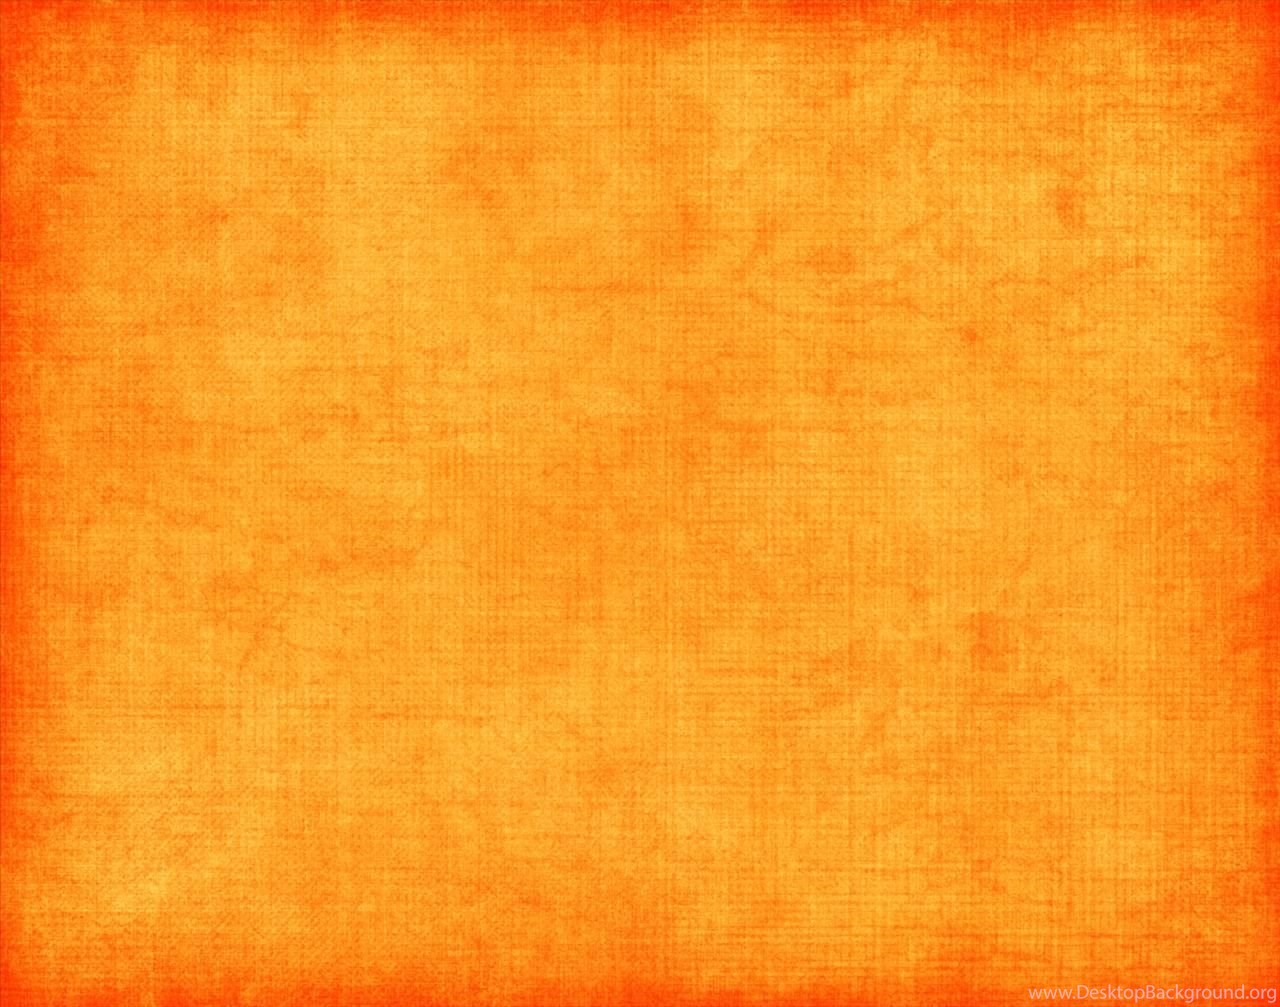 Orange Background Wallpapers Hd 142458 Hair Original Salon Studio Desktop Background